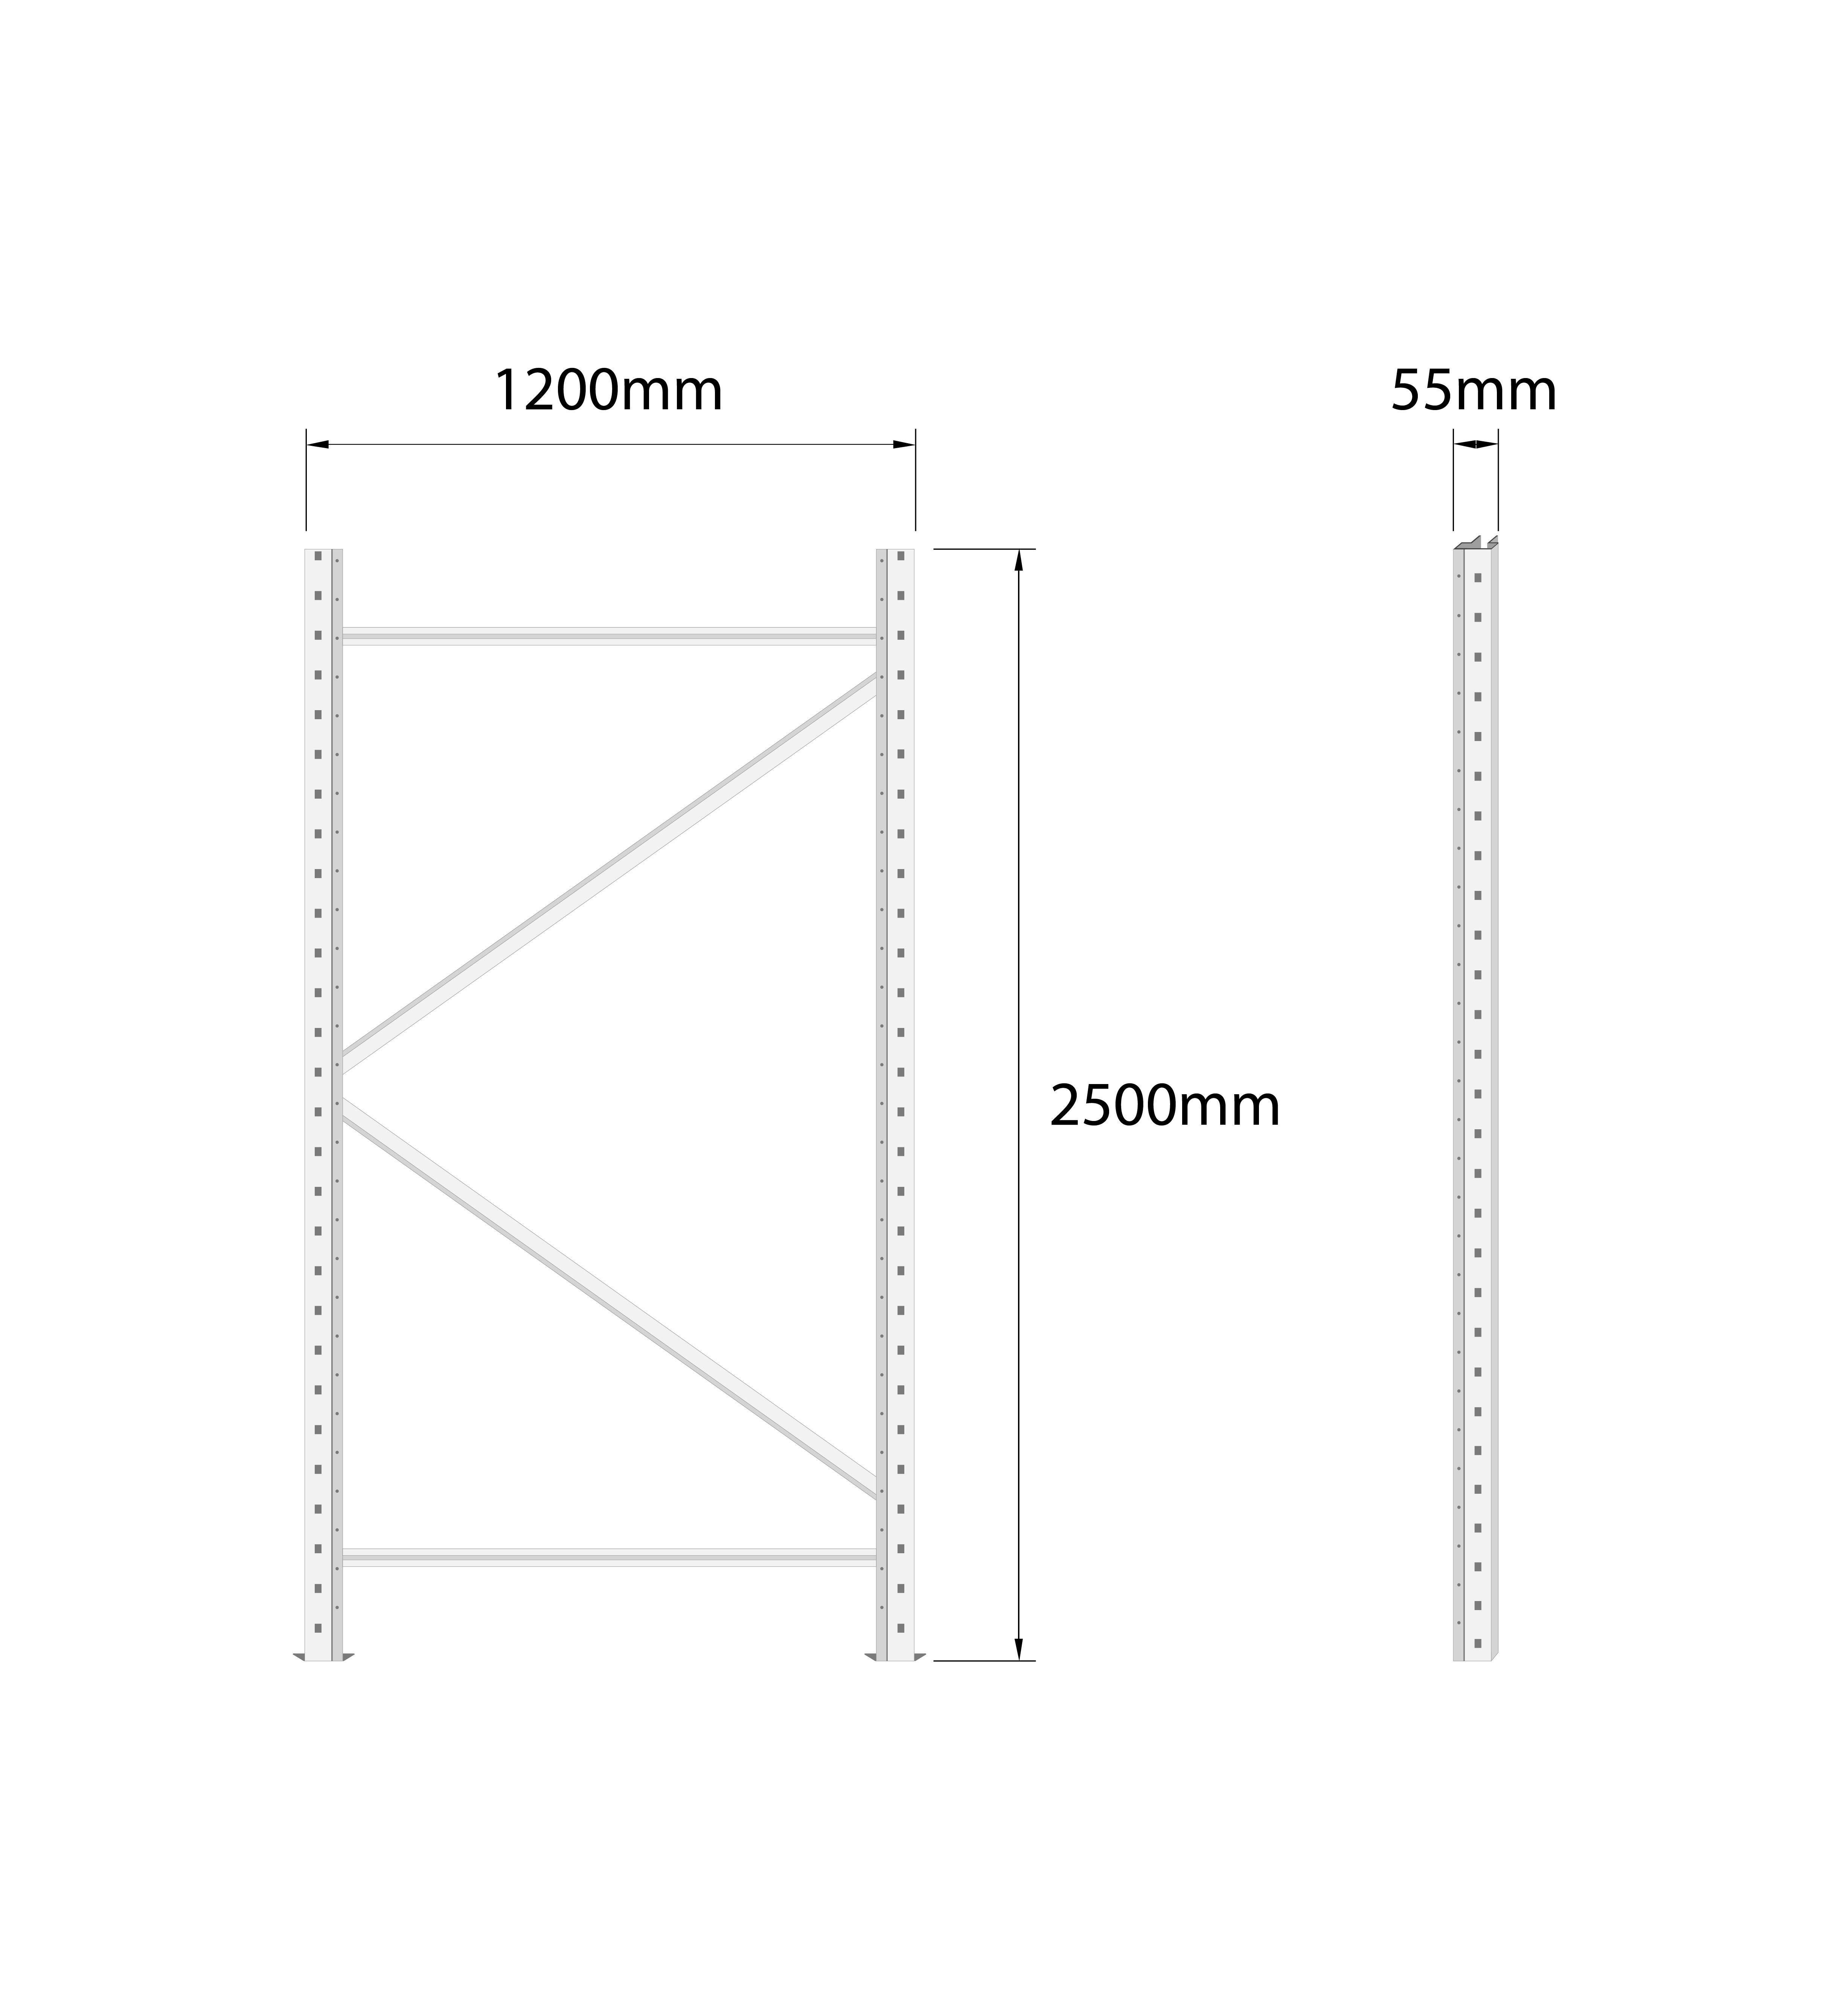 longspan - Uprights 2500mm_2500 x 1200 white.jpg